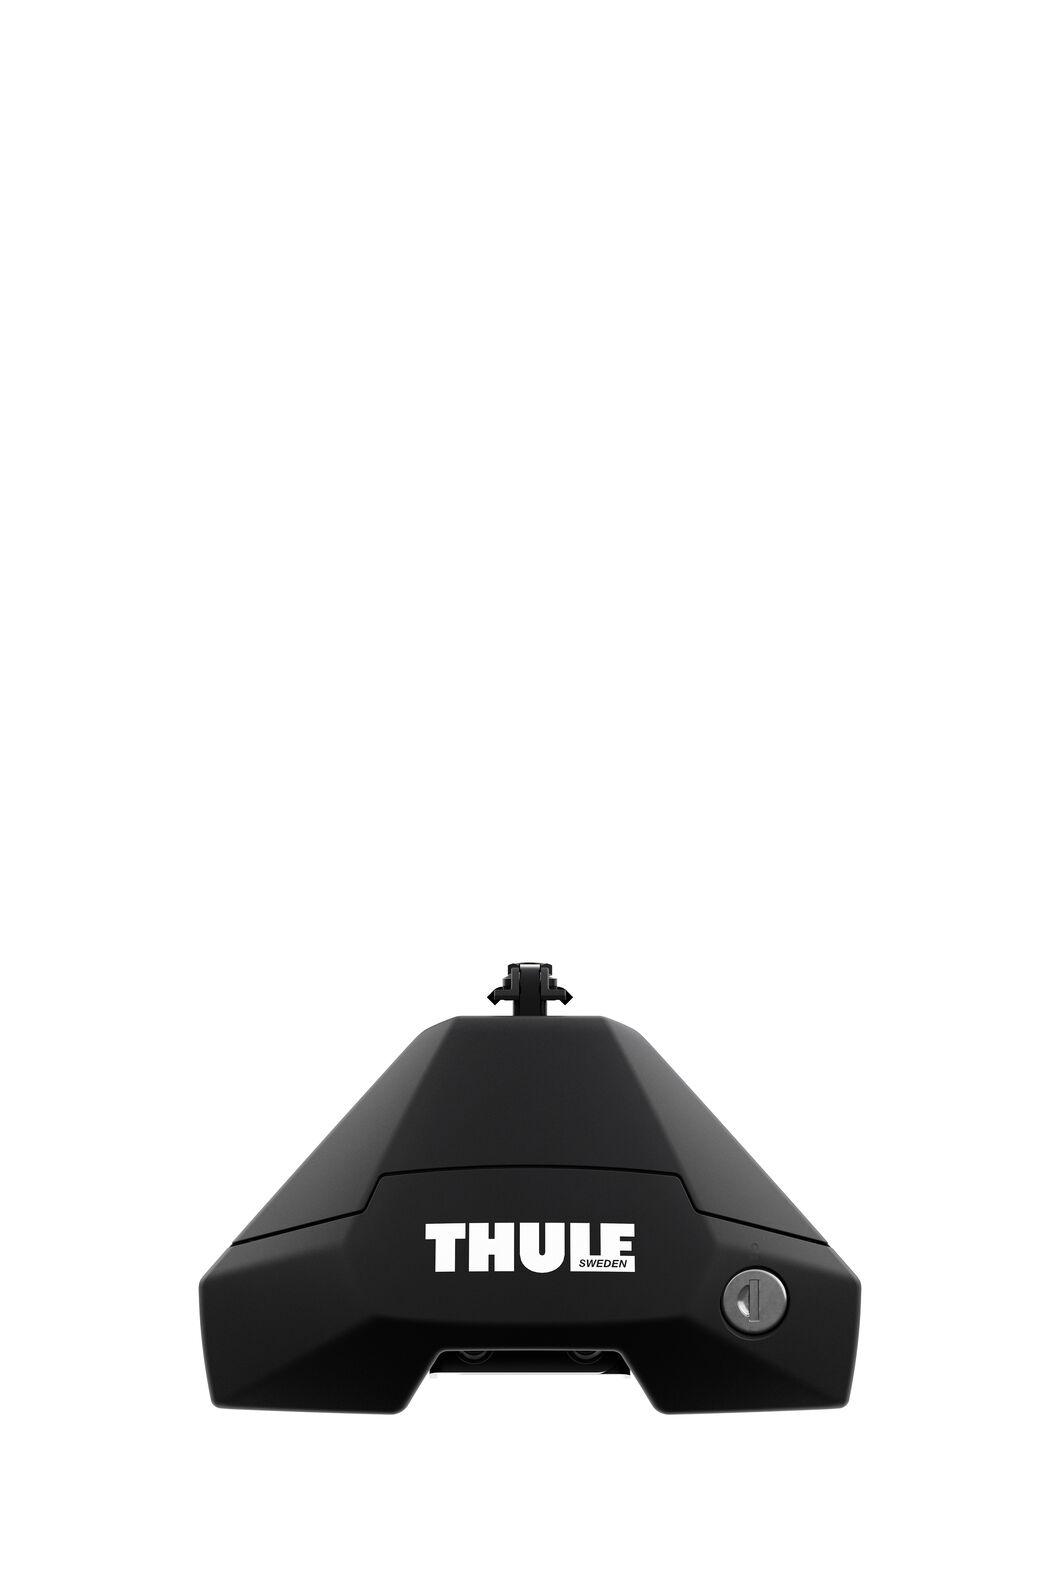 Thule Evo Clamp Foot Pack — Set of 4, None, hi-res